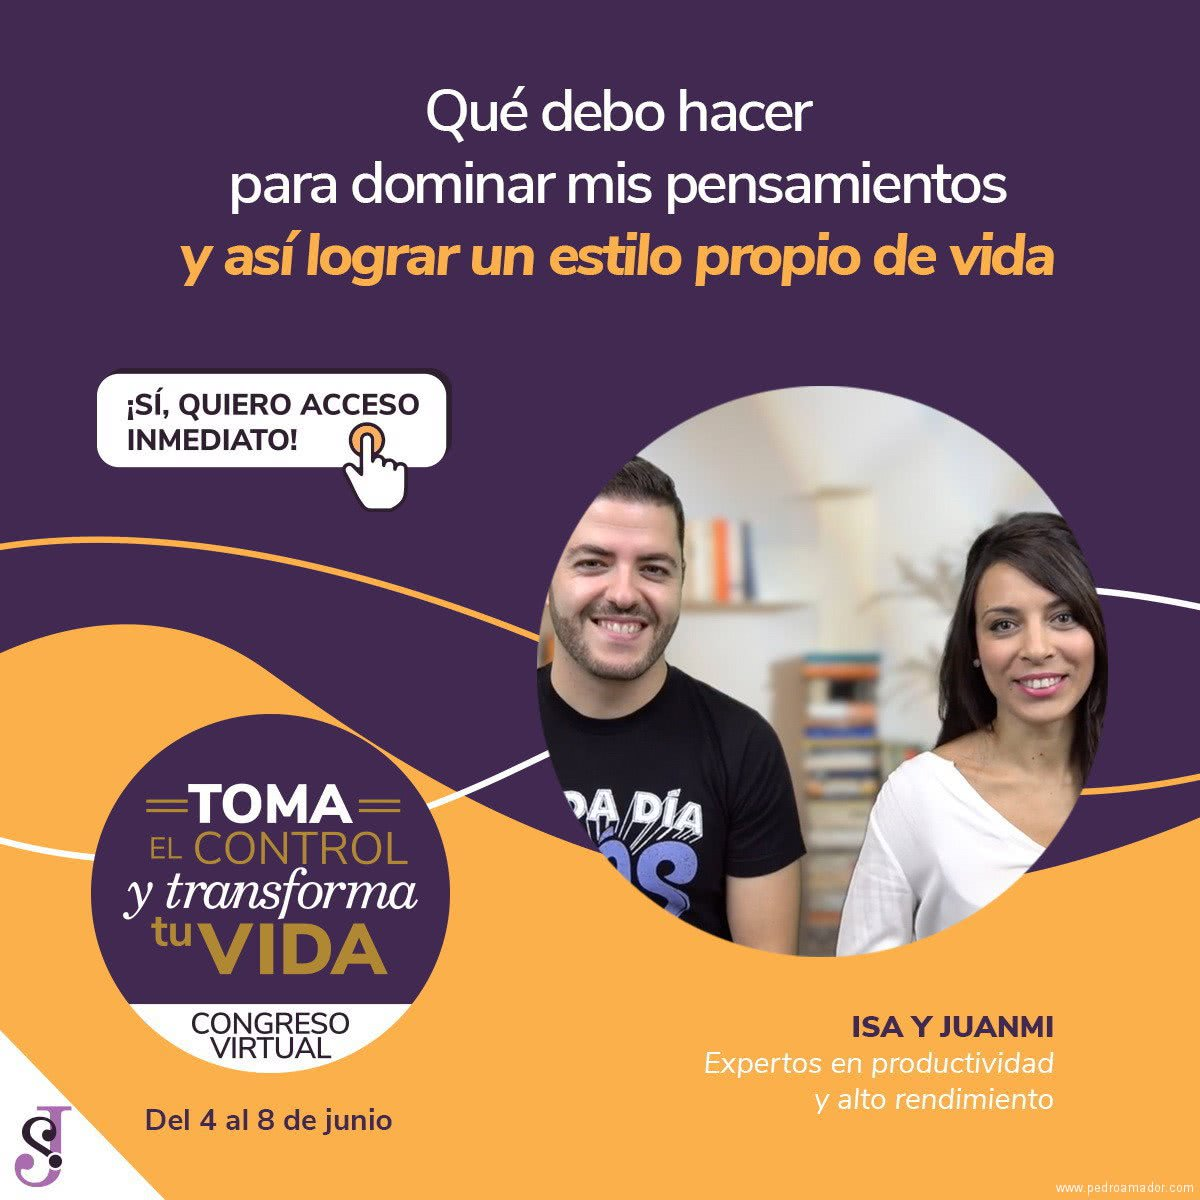 Transforma tu vida - Isa y Juanmi